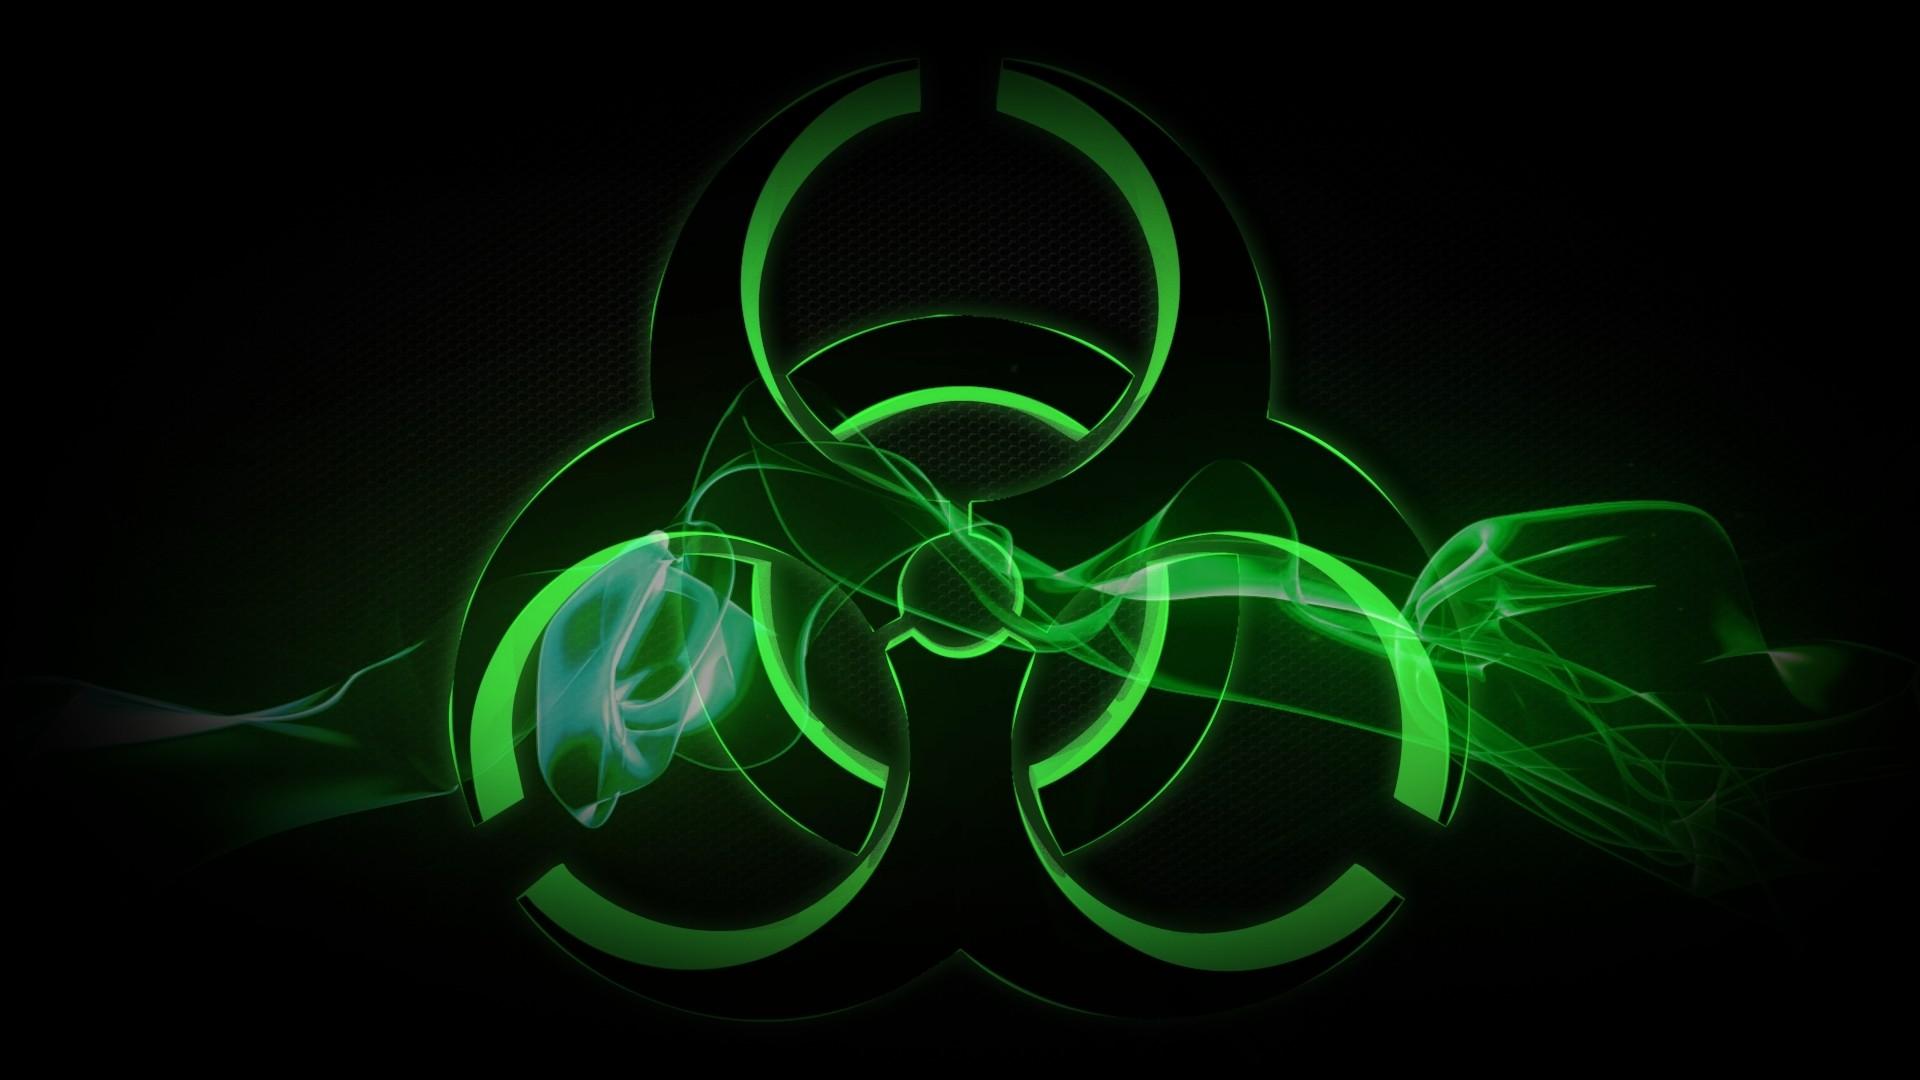 biohazard Wallpapers HD Desktop and Mobile Backgrounds 1920x1080